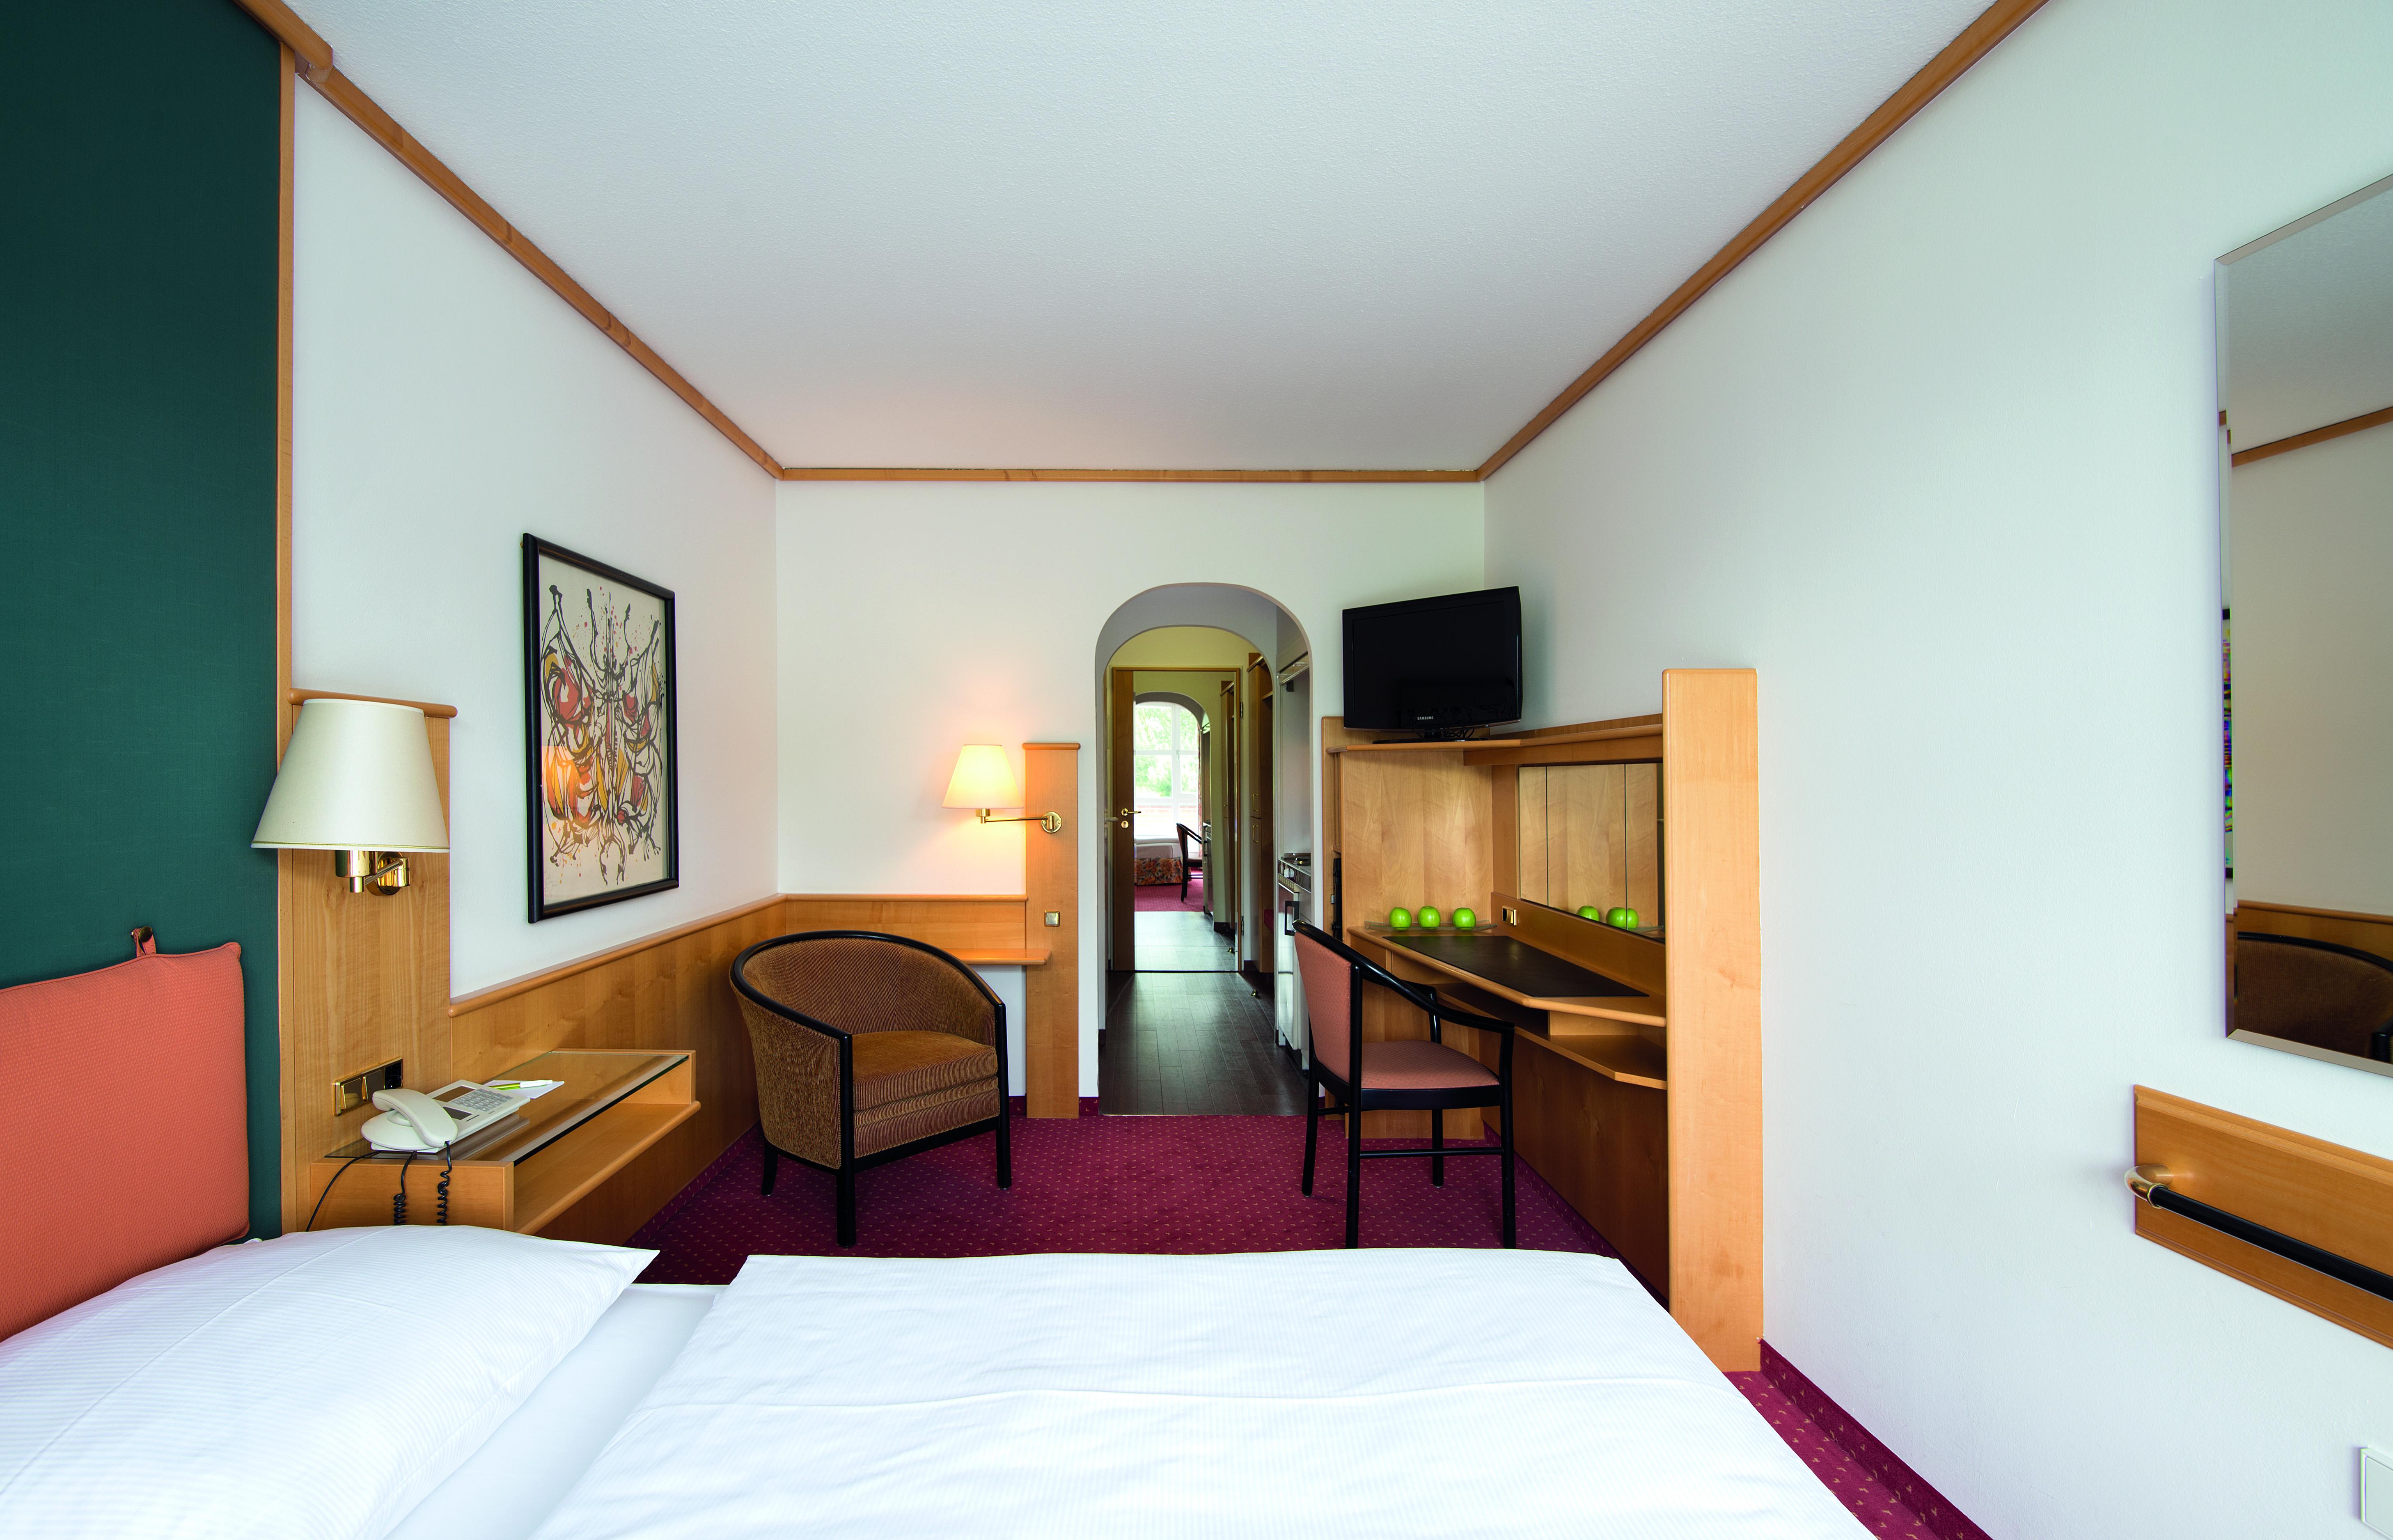 Living-Hotel-am-Olympiapark-München-Economy-Bett